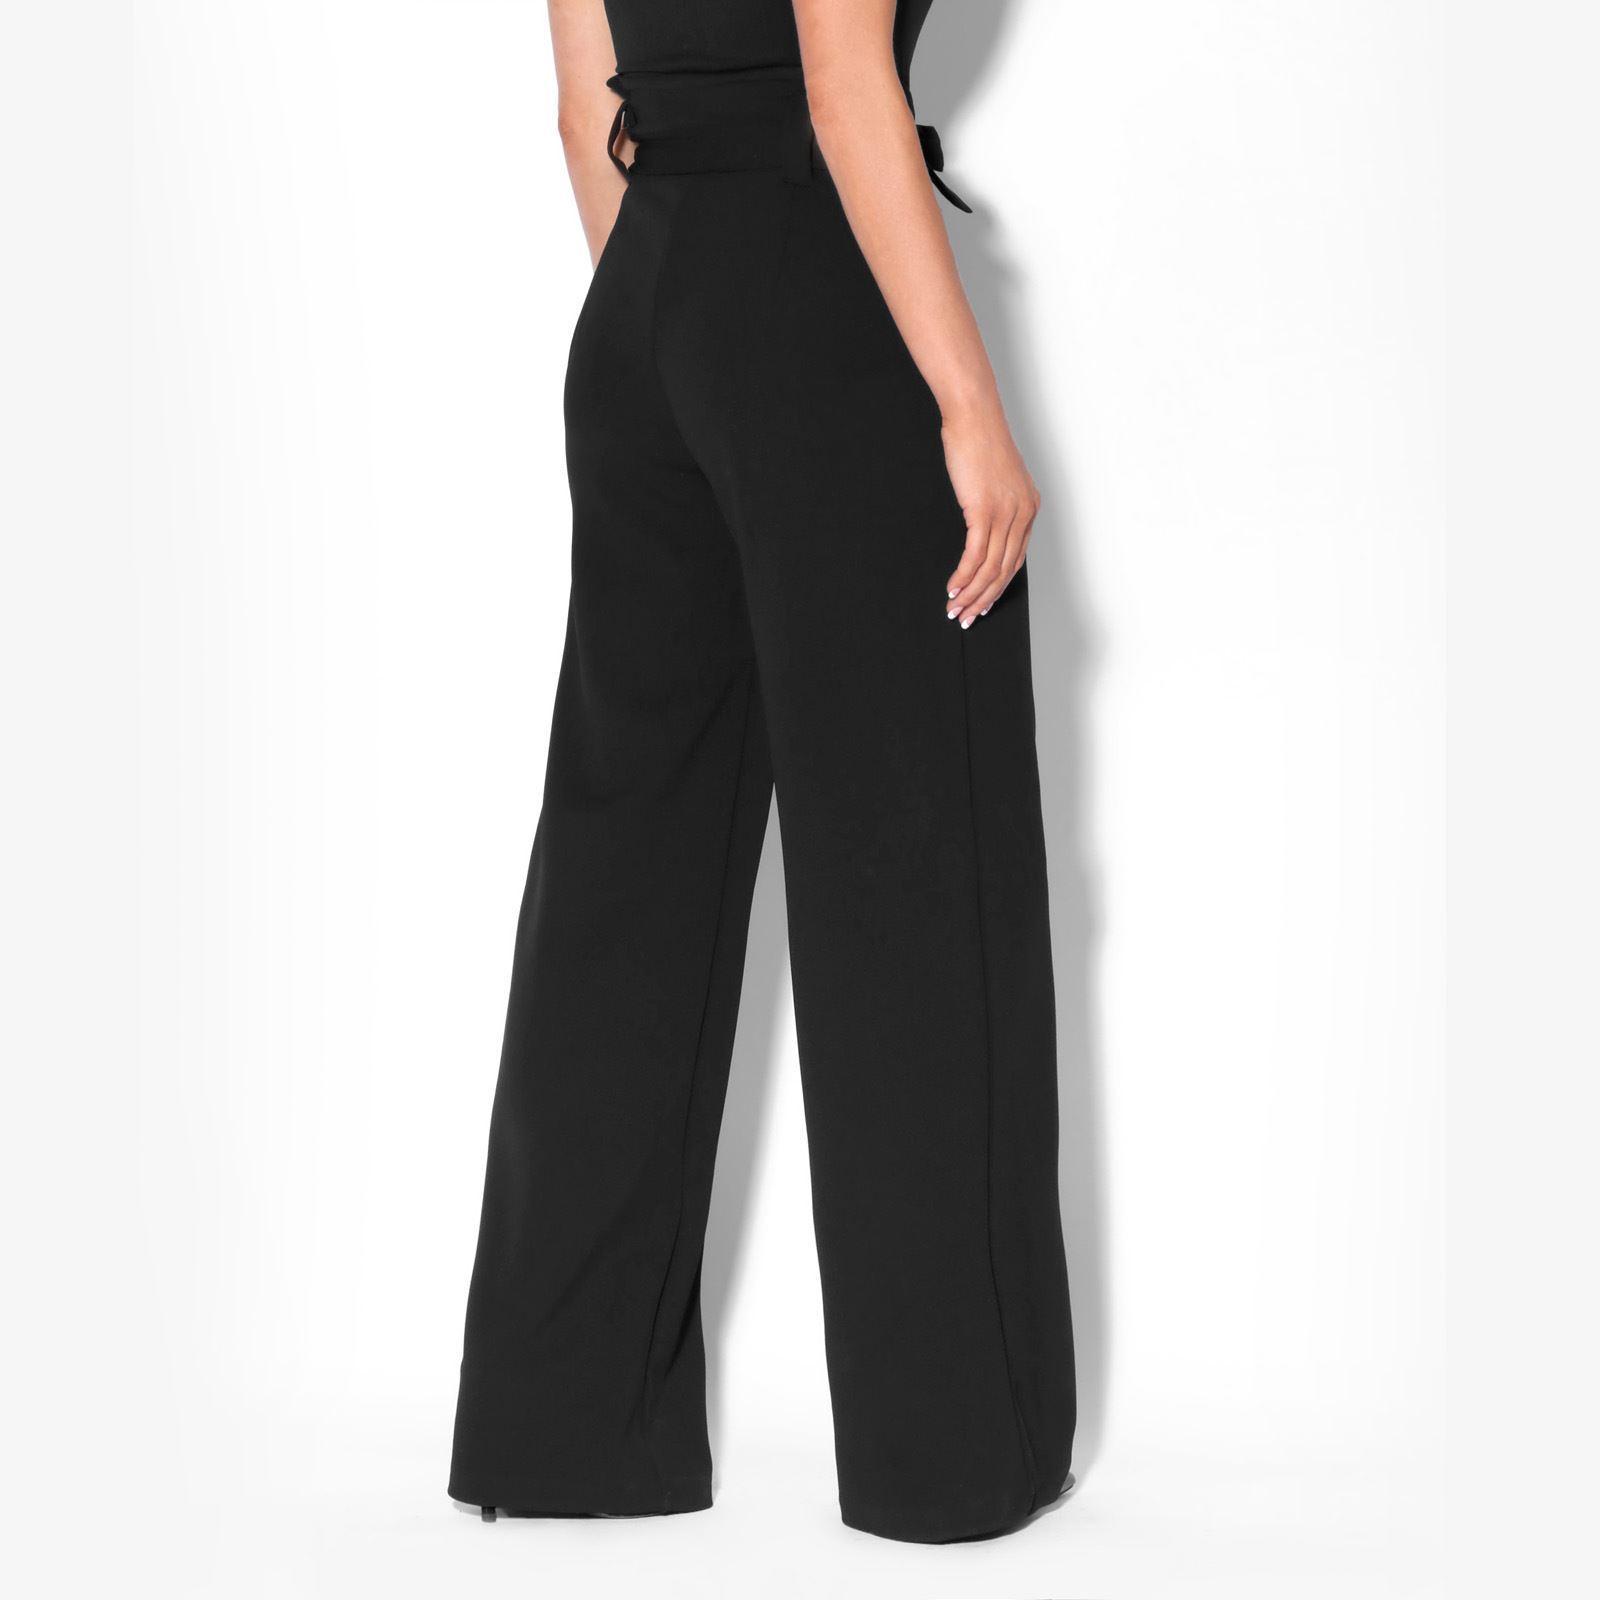 Womens-Ladies-High-Waist-Wide-Leg-Trousers-Paper-Bag-Flared-Leg-Palazzo-Pants thumbnail 3